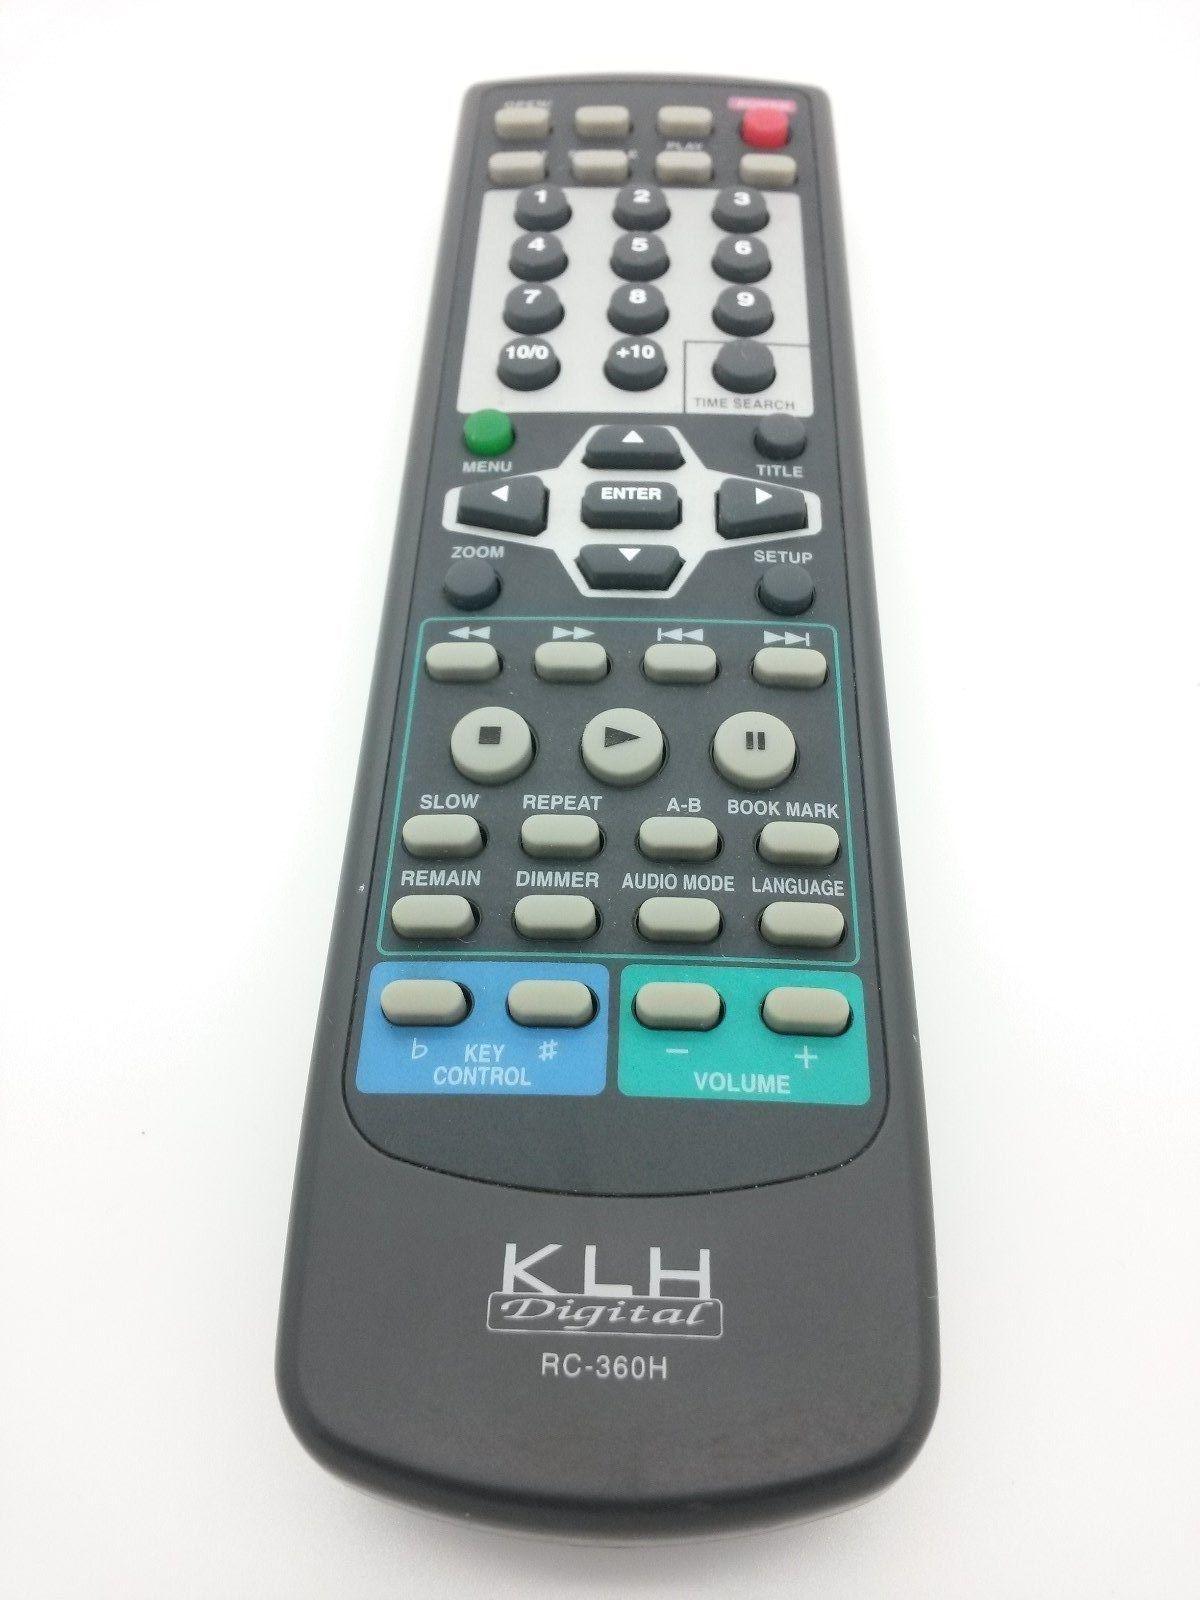 KLH DIGITAL RC360H DVD PLAYER REMOTE CONTROL DVD-8350 RC360H DVD8350